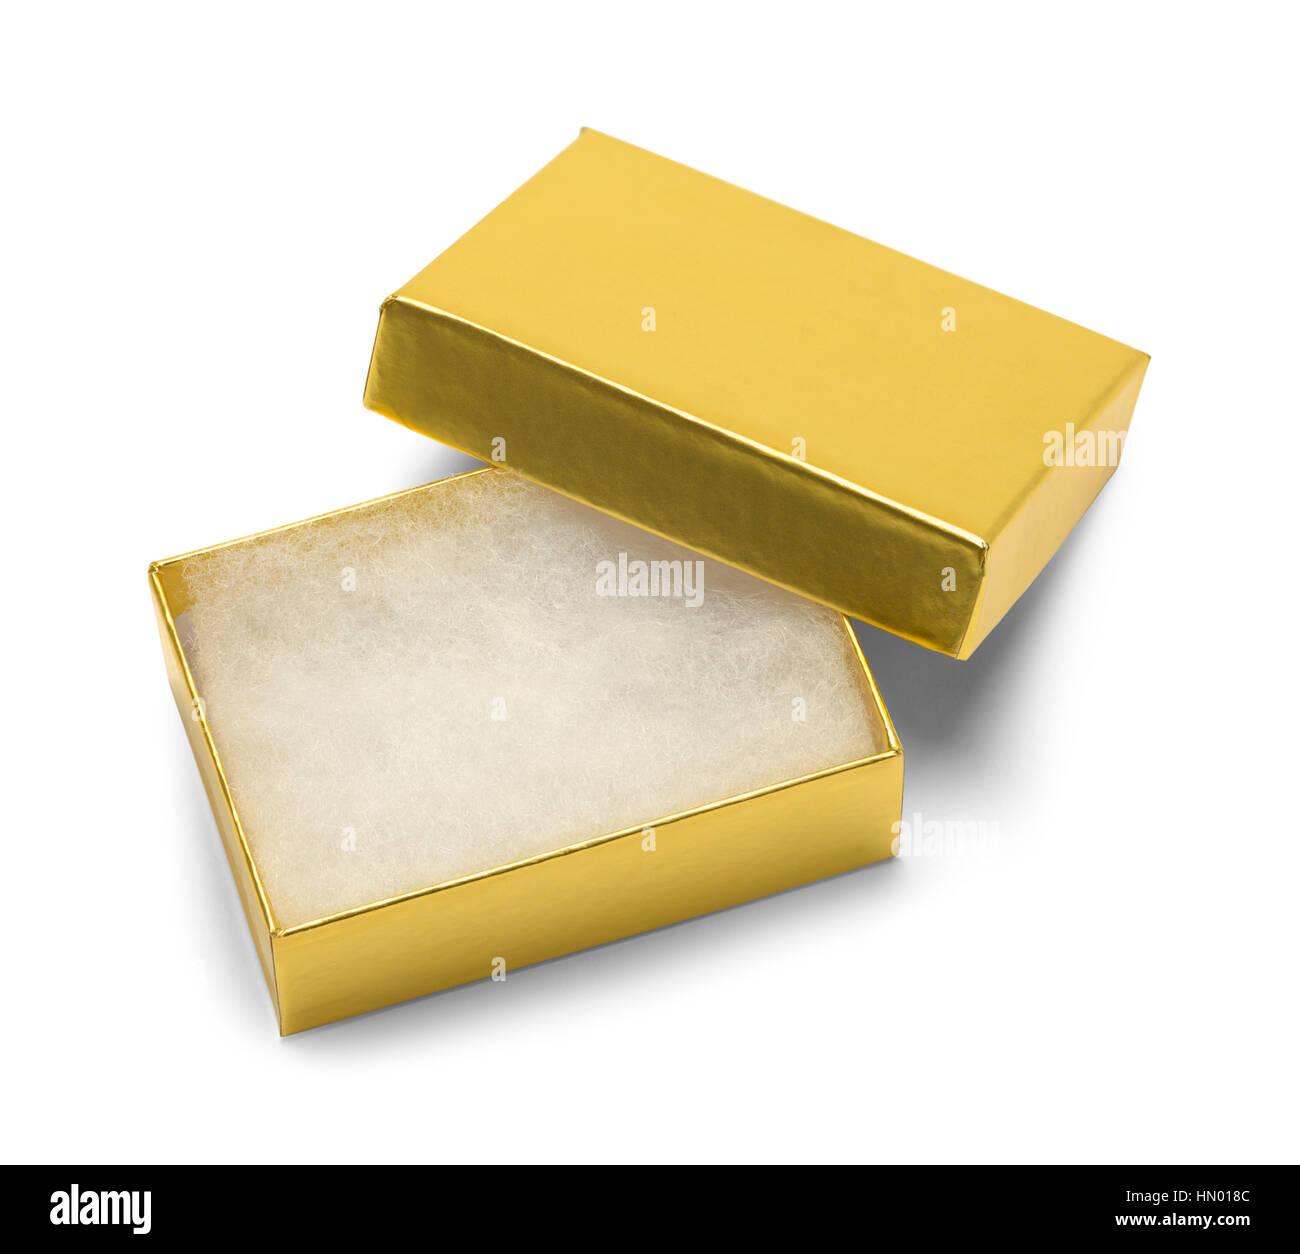 Leere goldene Jewerly Geschenk-Box, Isolated on White Background. Stockbild